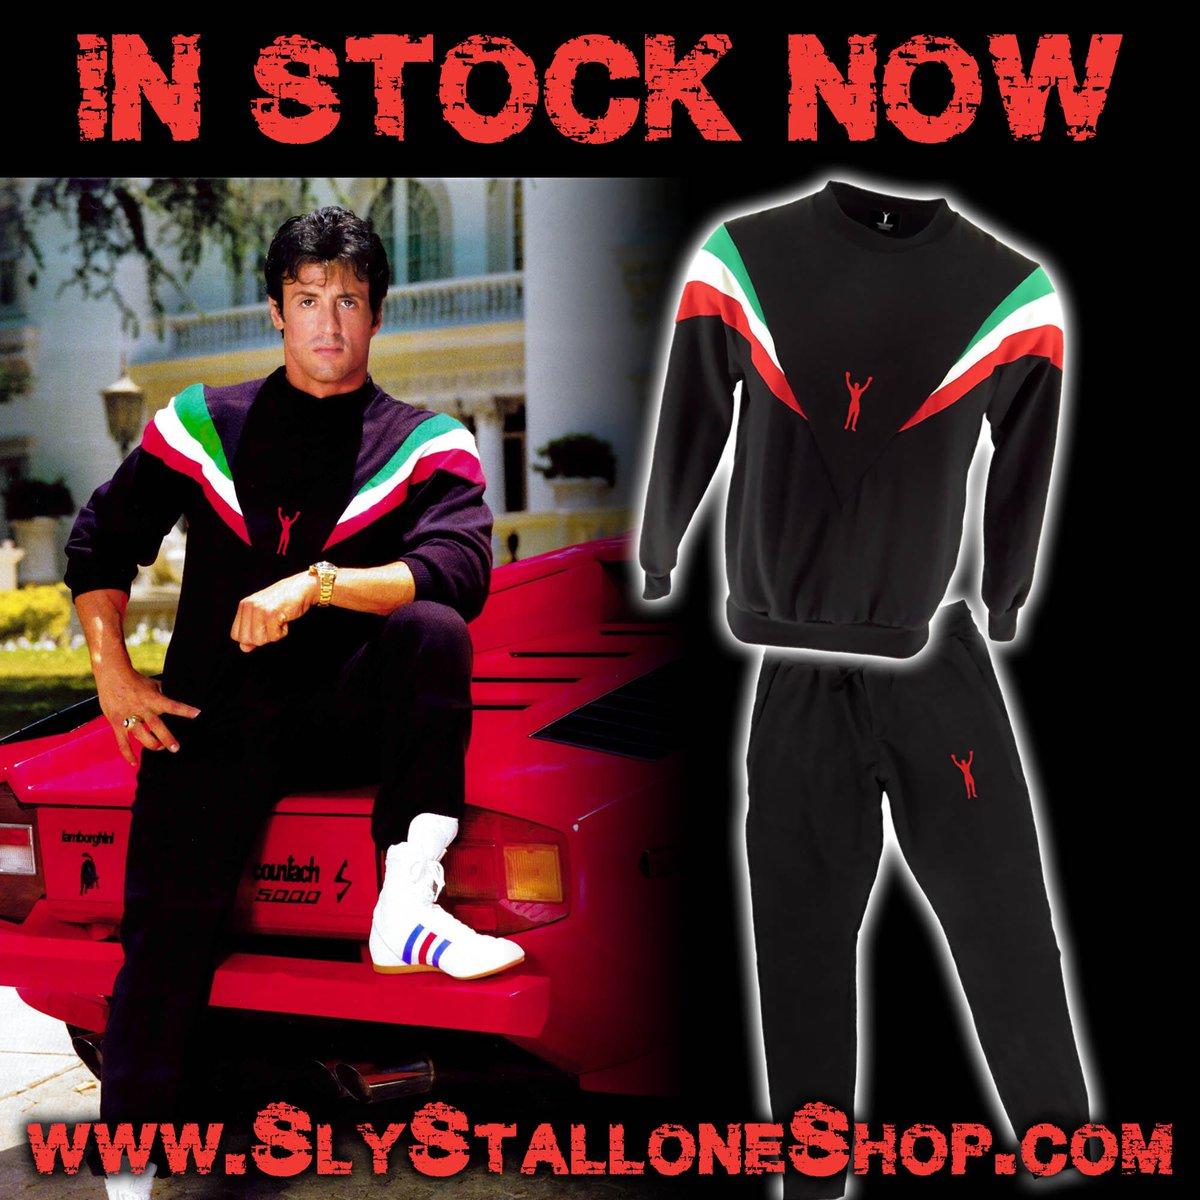 Men Sly Stallone Shop